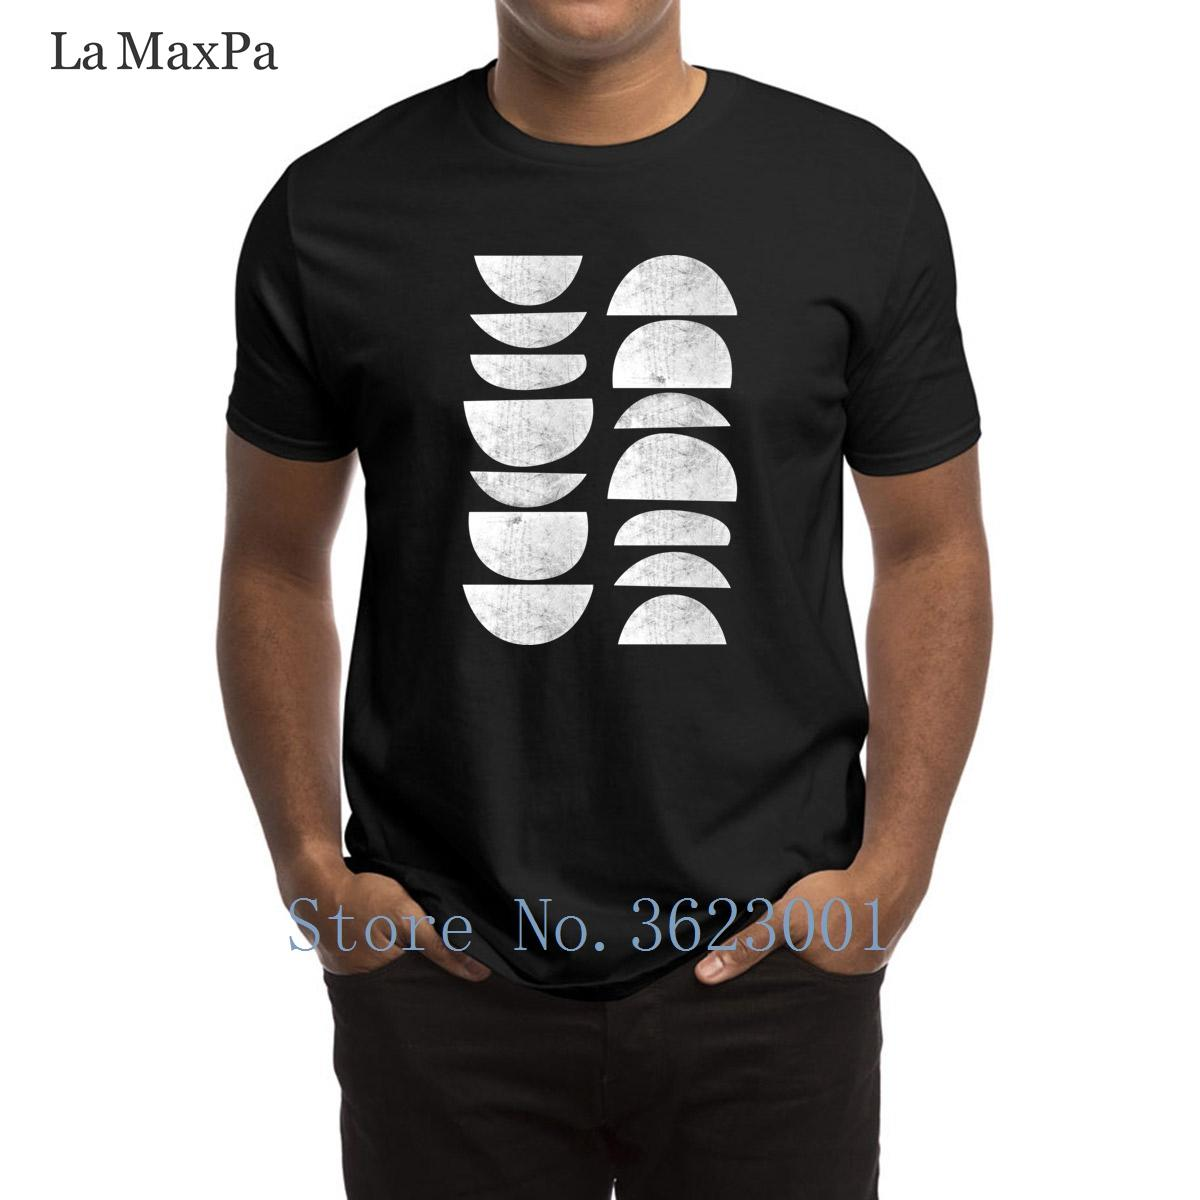 bb68541af2af Acquista Design T Shirt Naturale Uomo Minimalista Monocromatico T Shirt  Uomo Siti Web T Shirt Leggera T Shirt Da Uomo In Cotone Moda Fit A  16.15  Dal ...